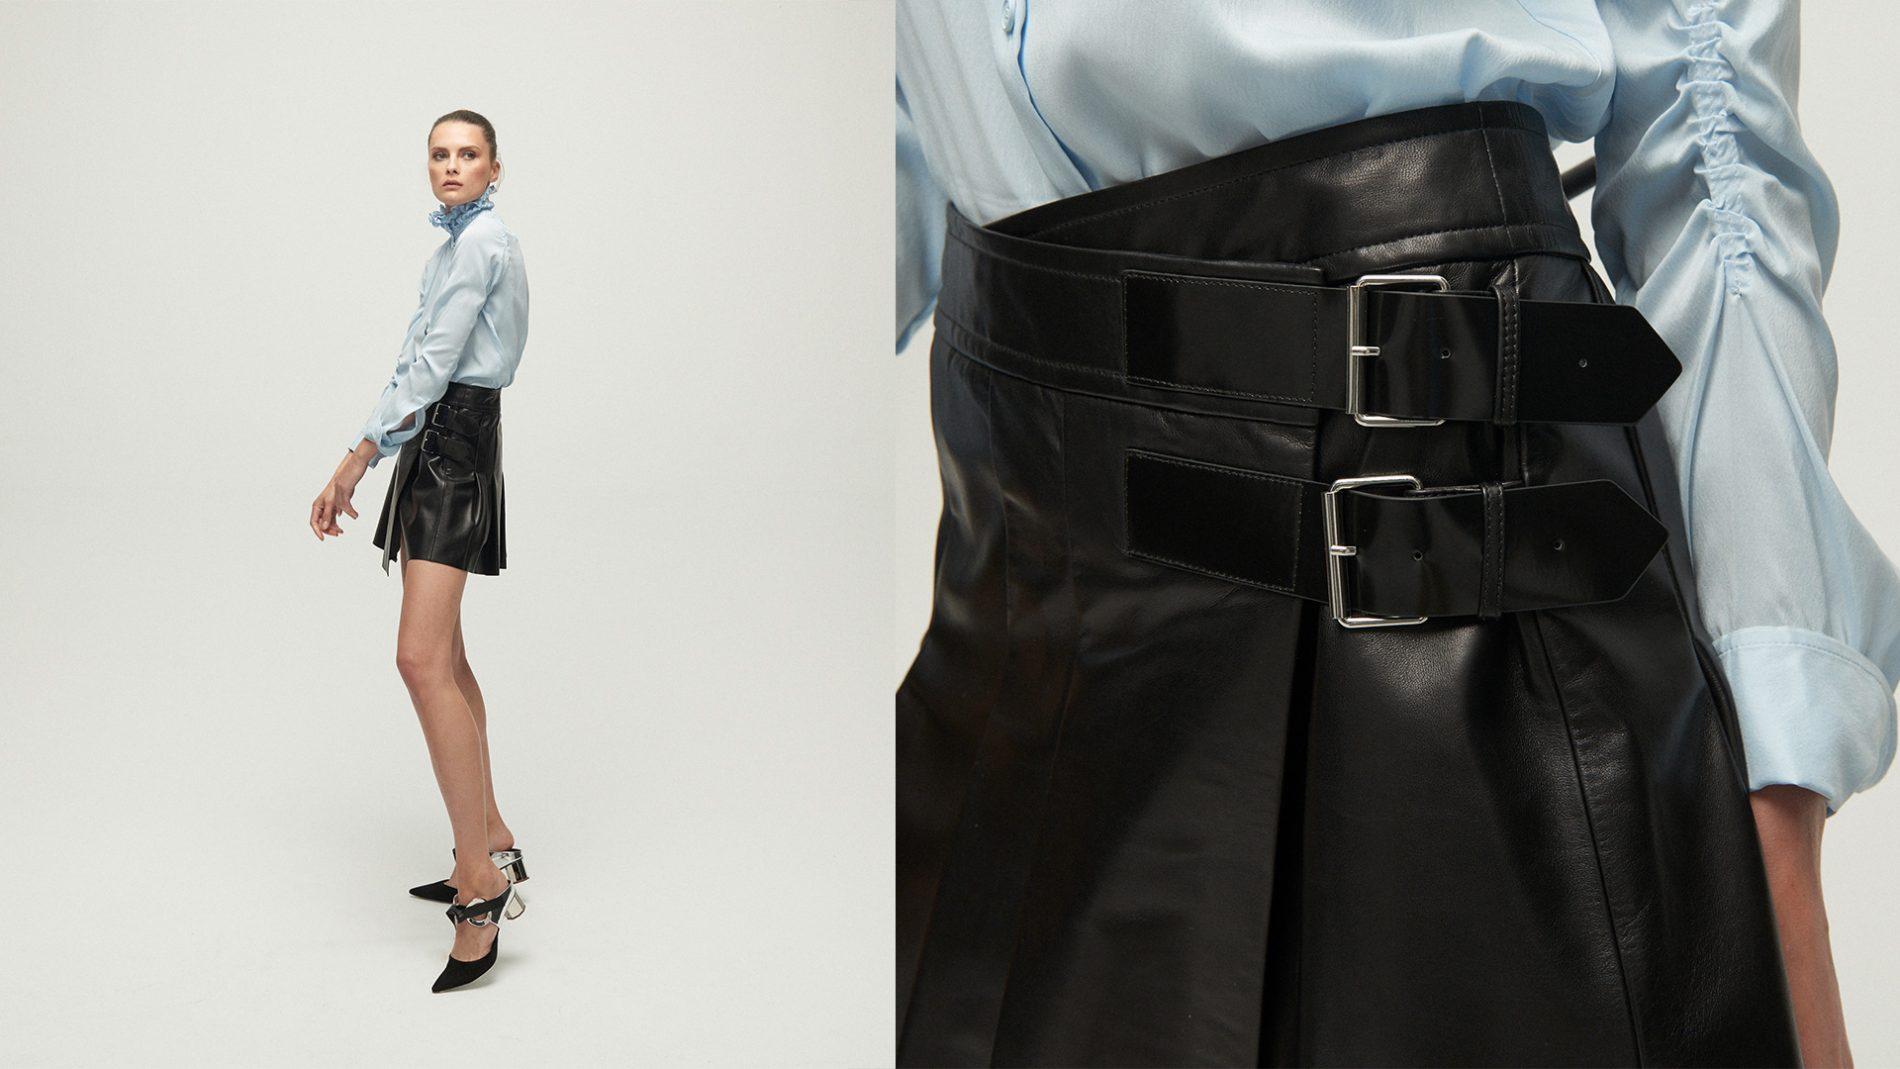 El Corte Inglés Designer Ready-To-Wear Shoes Helmut Lang Carven Proenza Schouler Leather